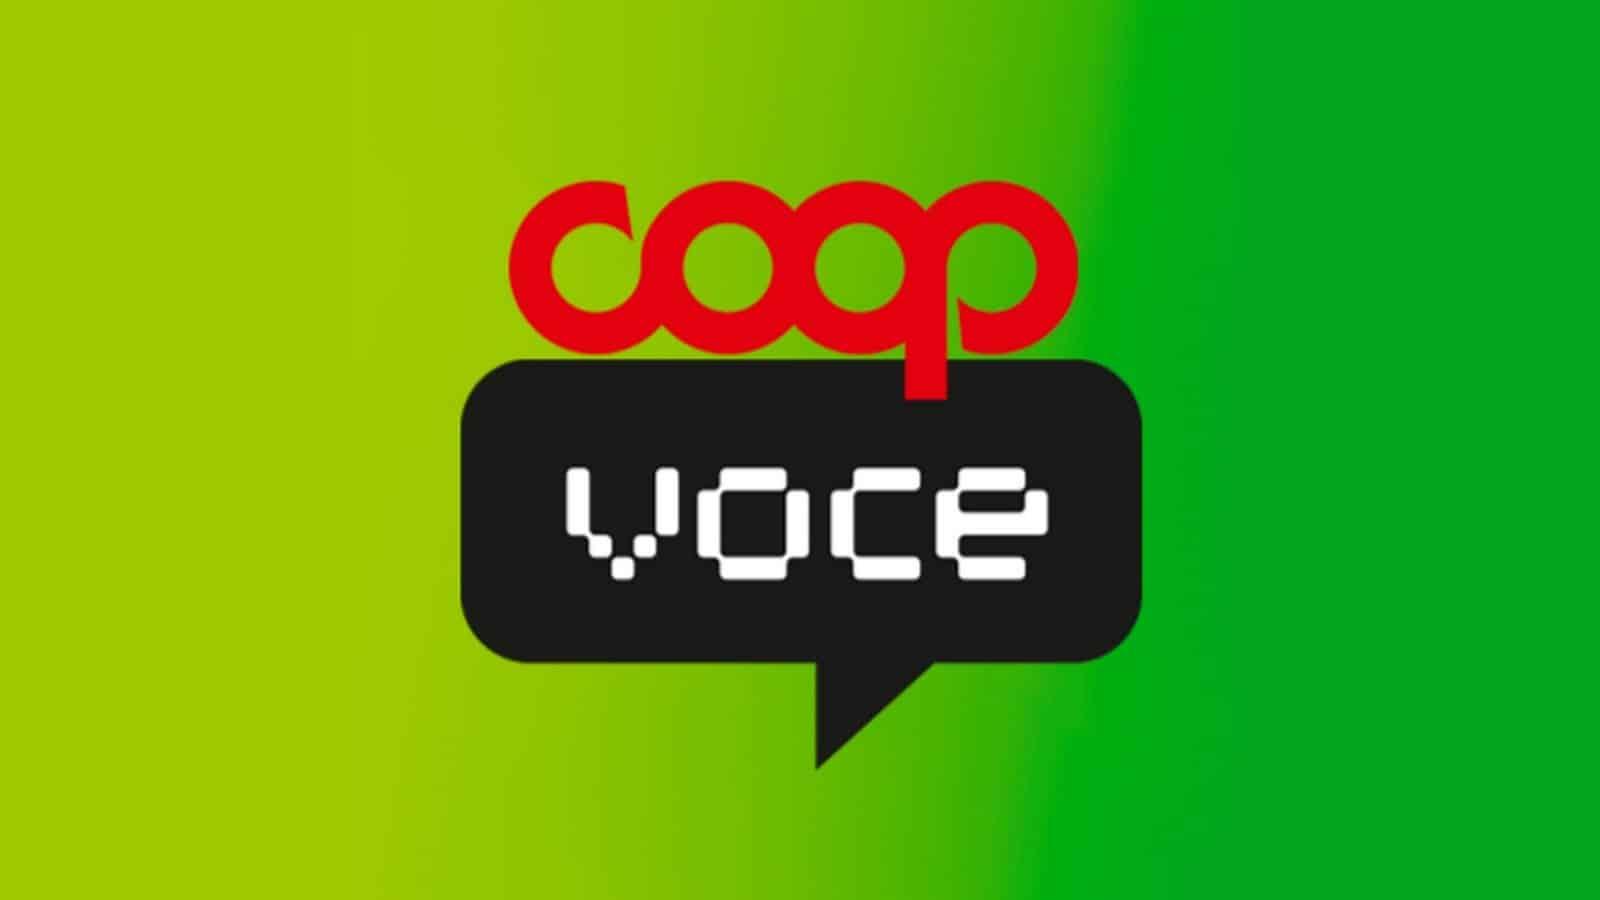 CoopVoce: minuti+SMS illimitati a 8€